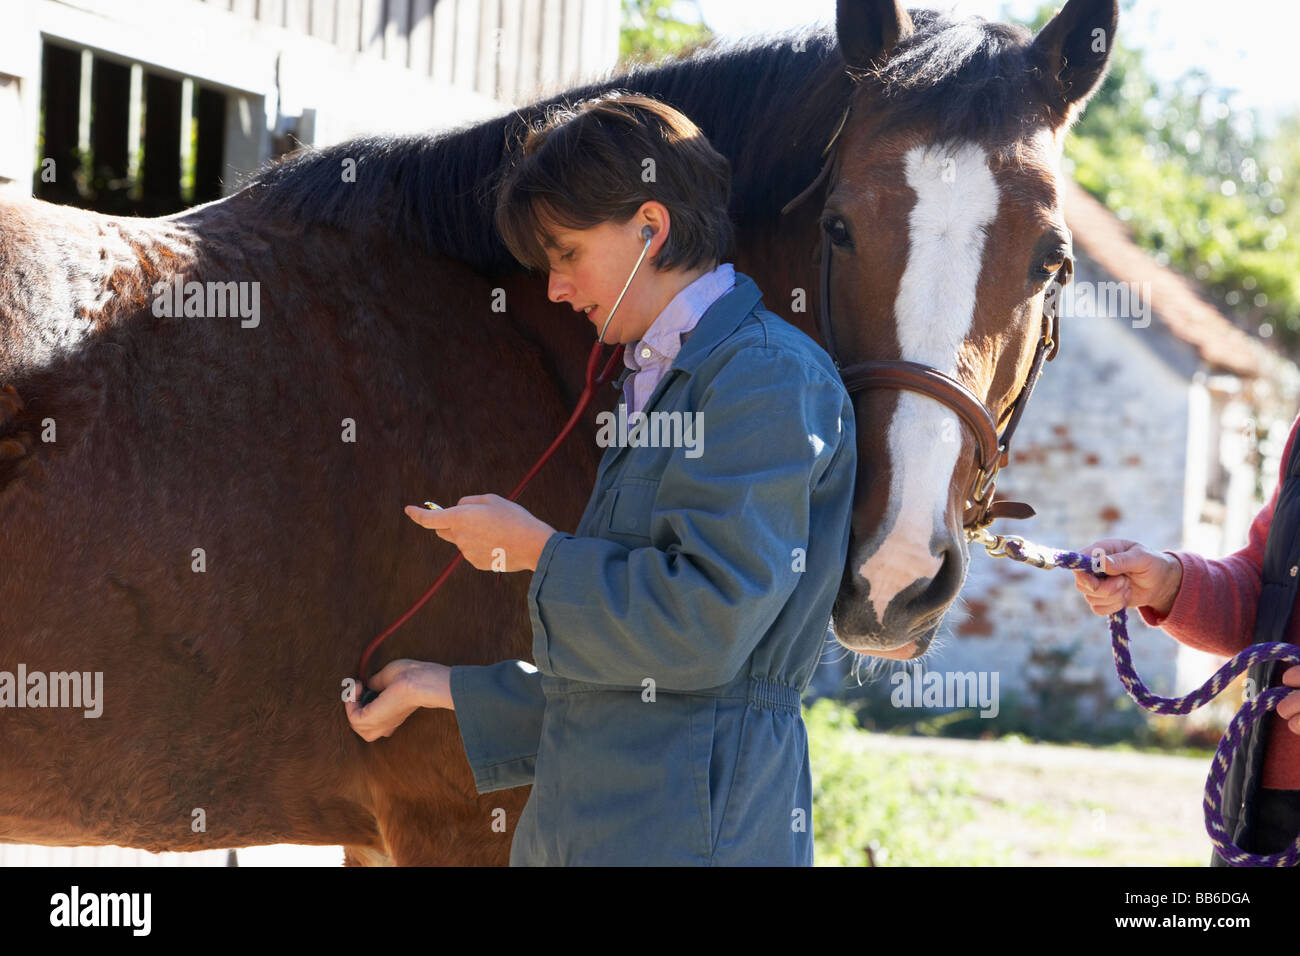 Vet Examining Horse With Stethescope - Stock Image